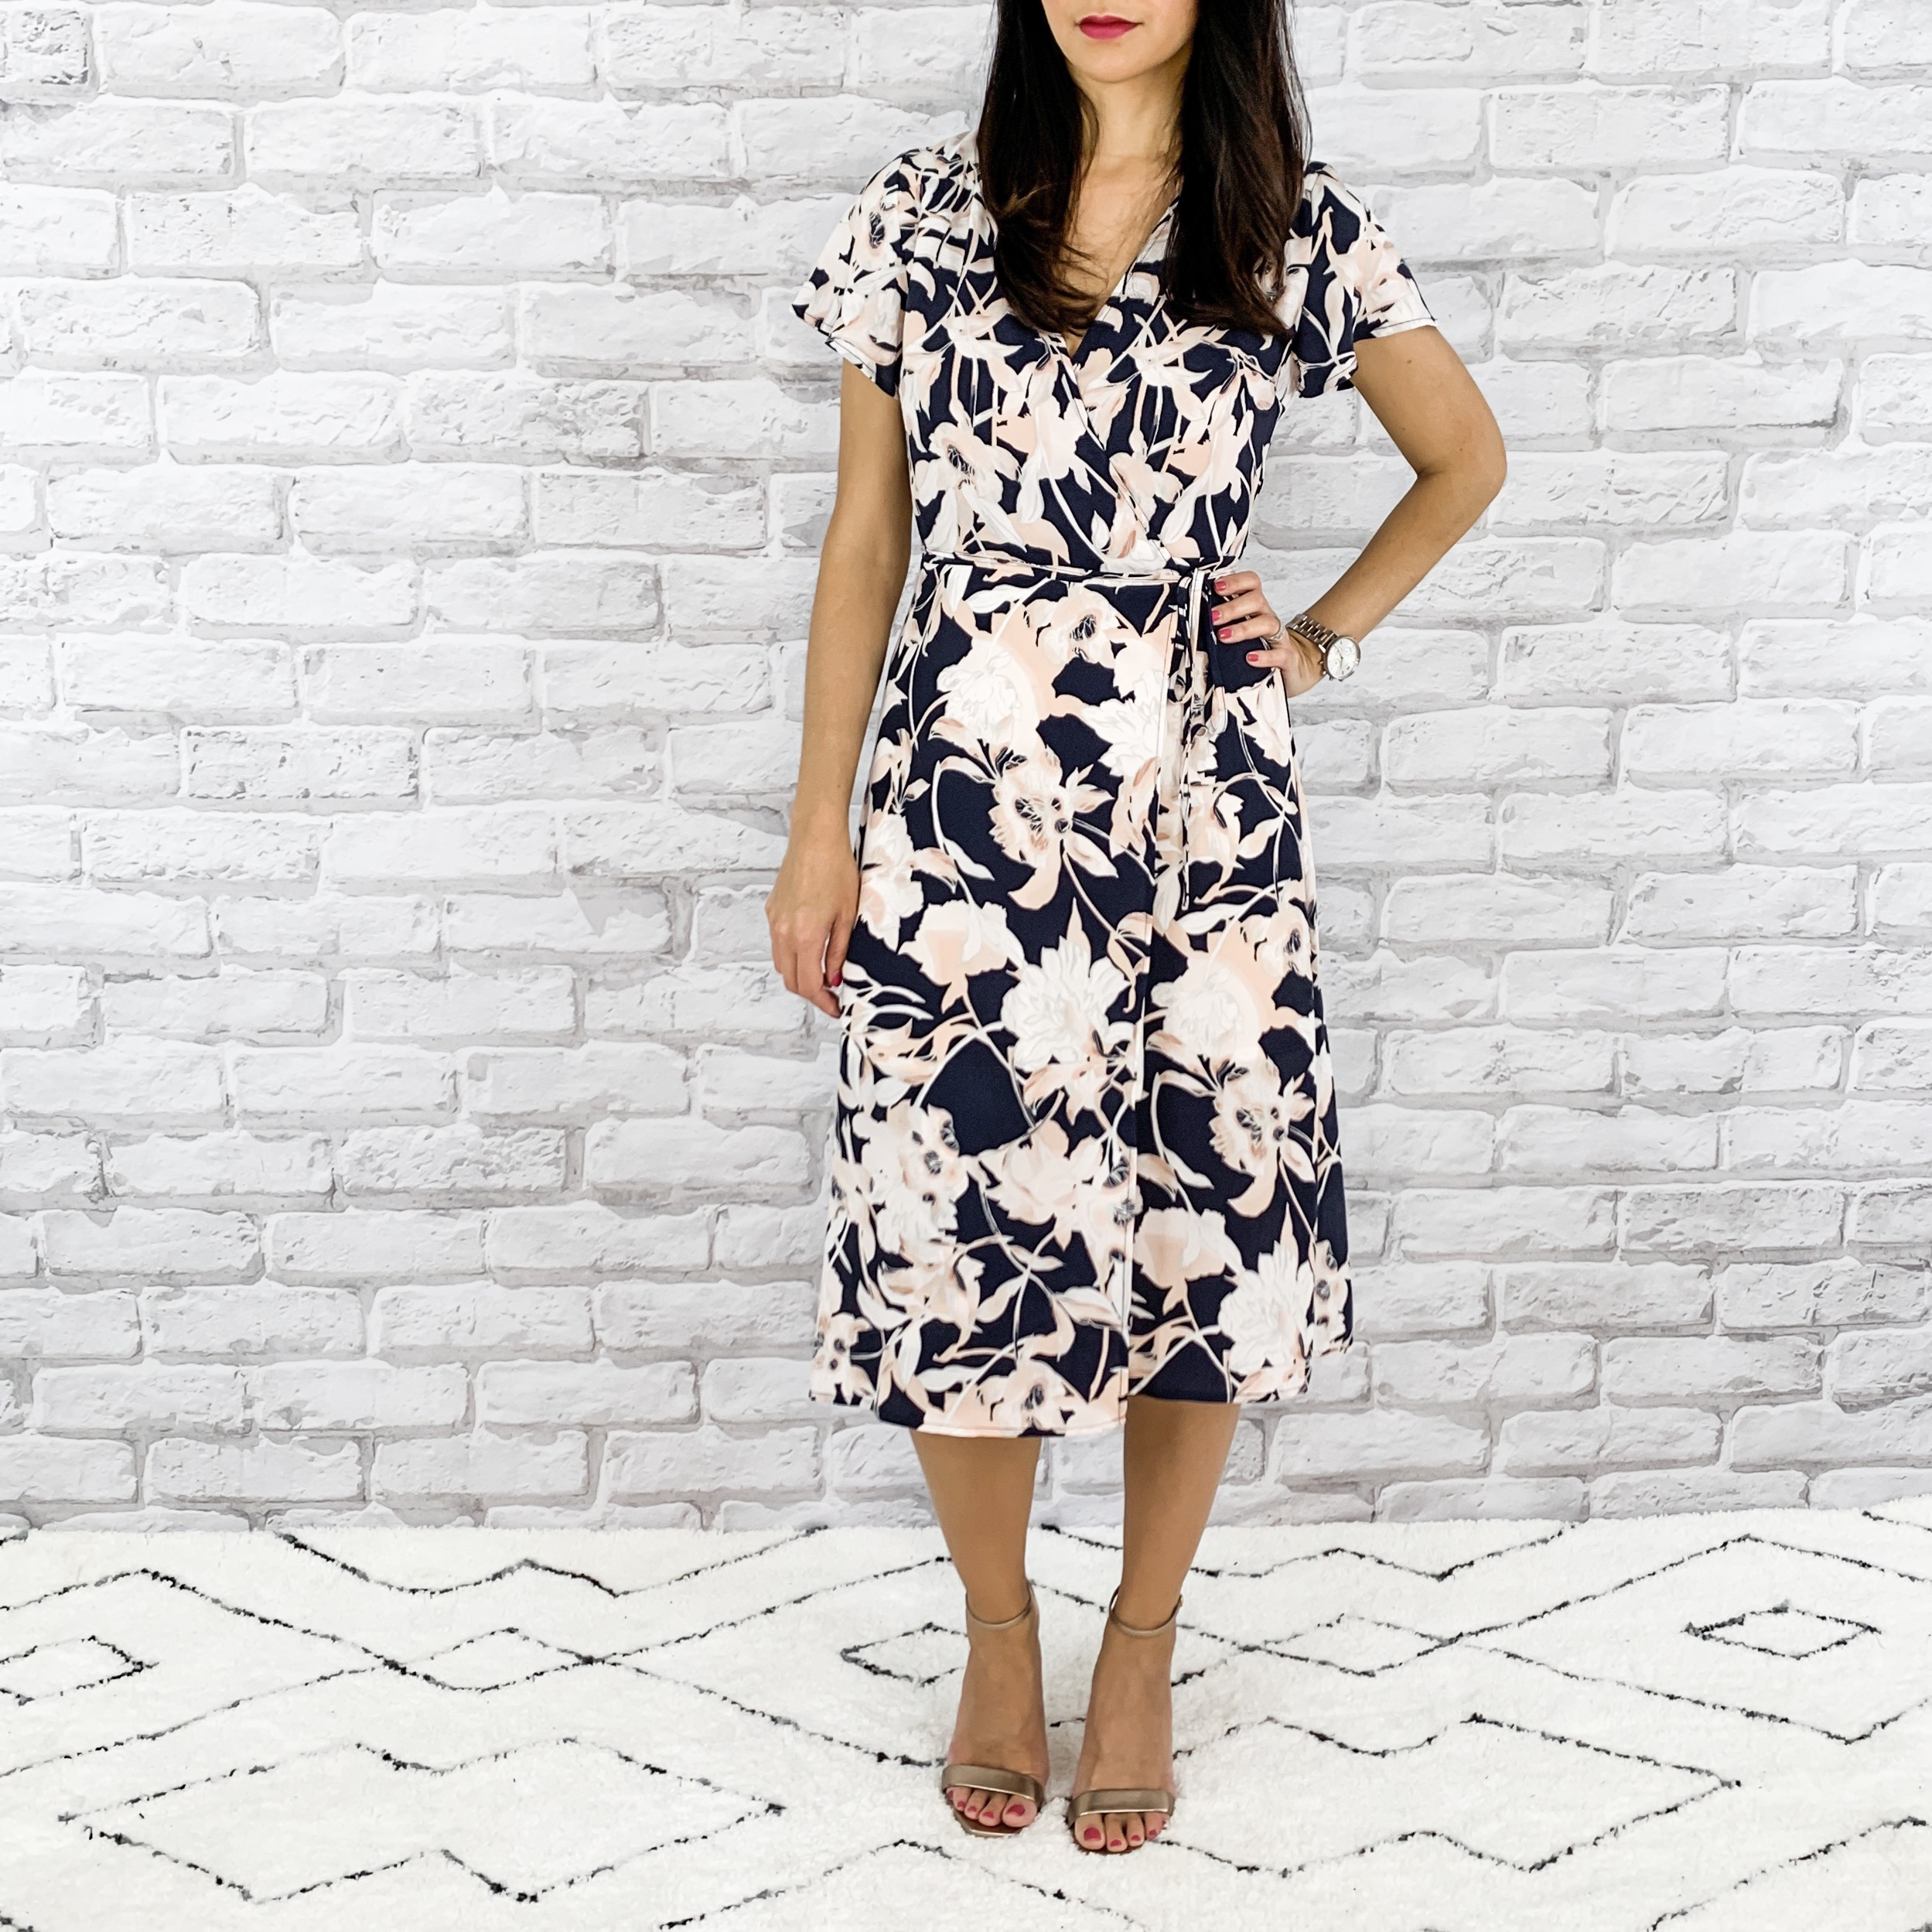 — OUTFIT DETAILS —    Leith Wrap Dress     |   Saint Laurent Shoes     — CCW DETAILS —    Can Can Concealment Garter Thigh Holster     | Glock 43